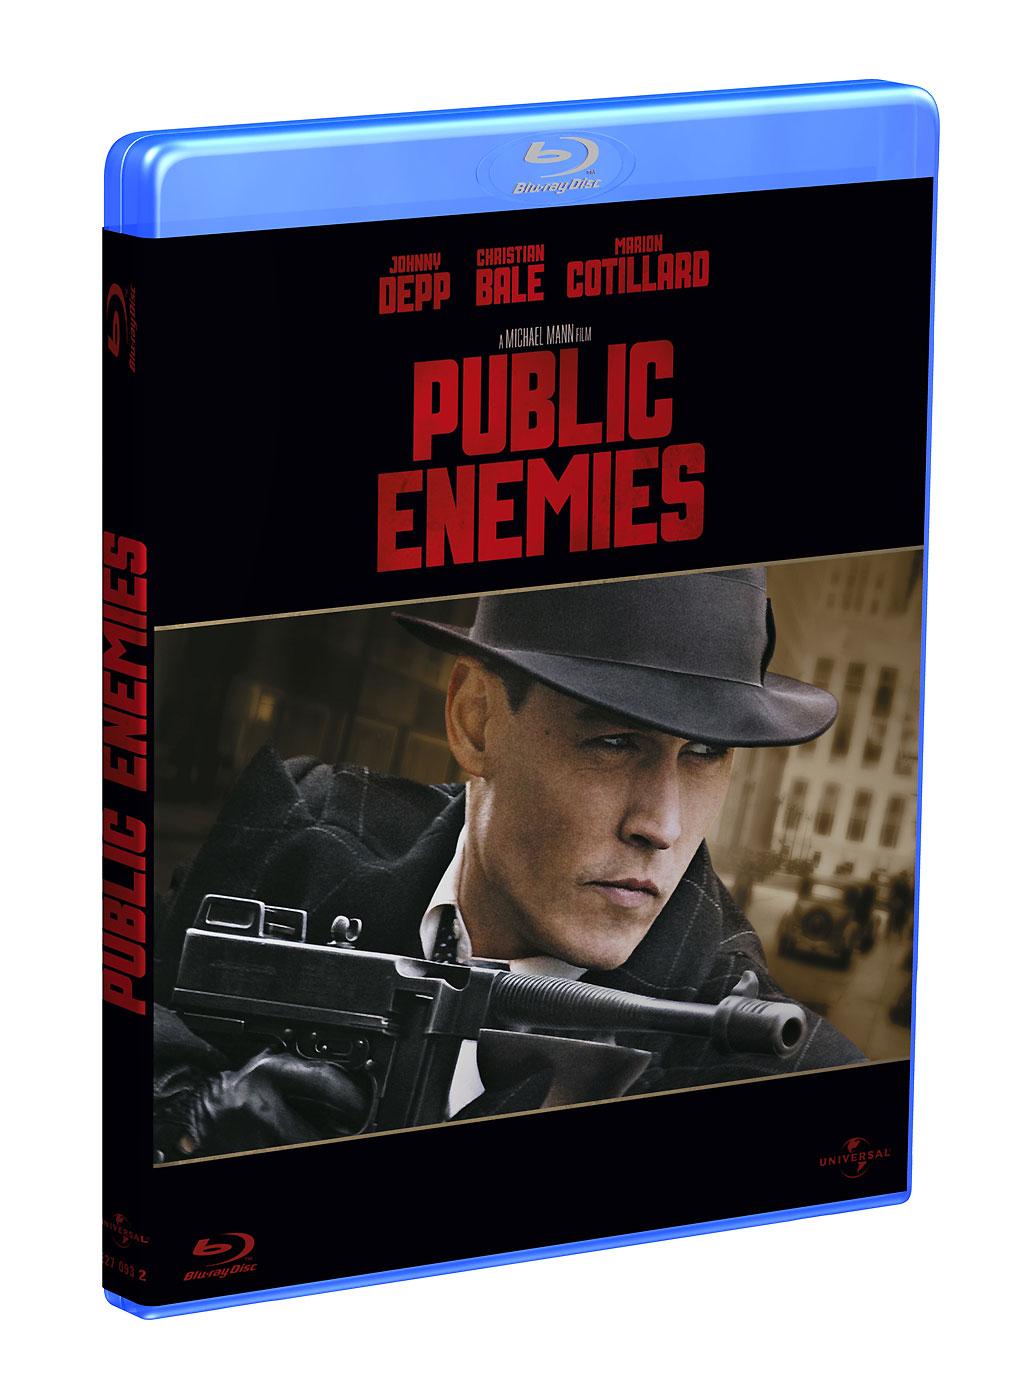 http://2.bp.blogspot.com/_u6cbcWj24Z4/Sw6glmyjF9I/AAAAAAAAAtc/byEtxSaqQ04/s1600/Public_enemies_blu-ray.jpg